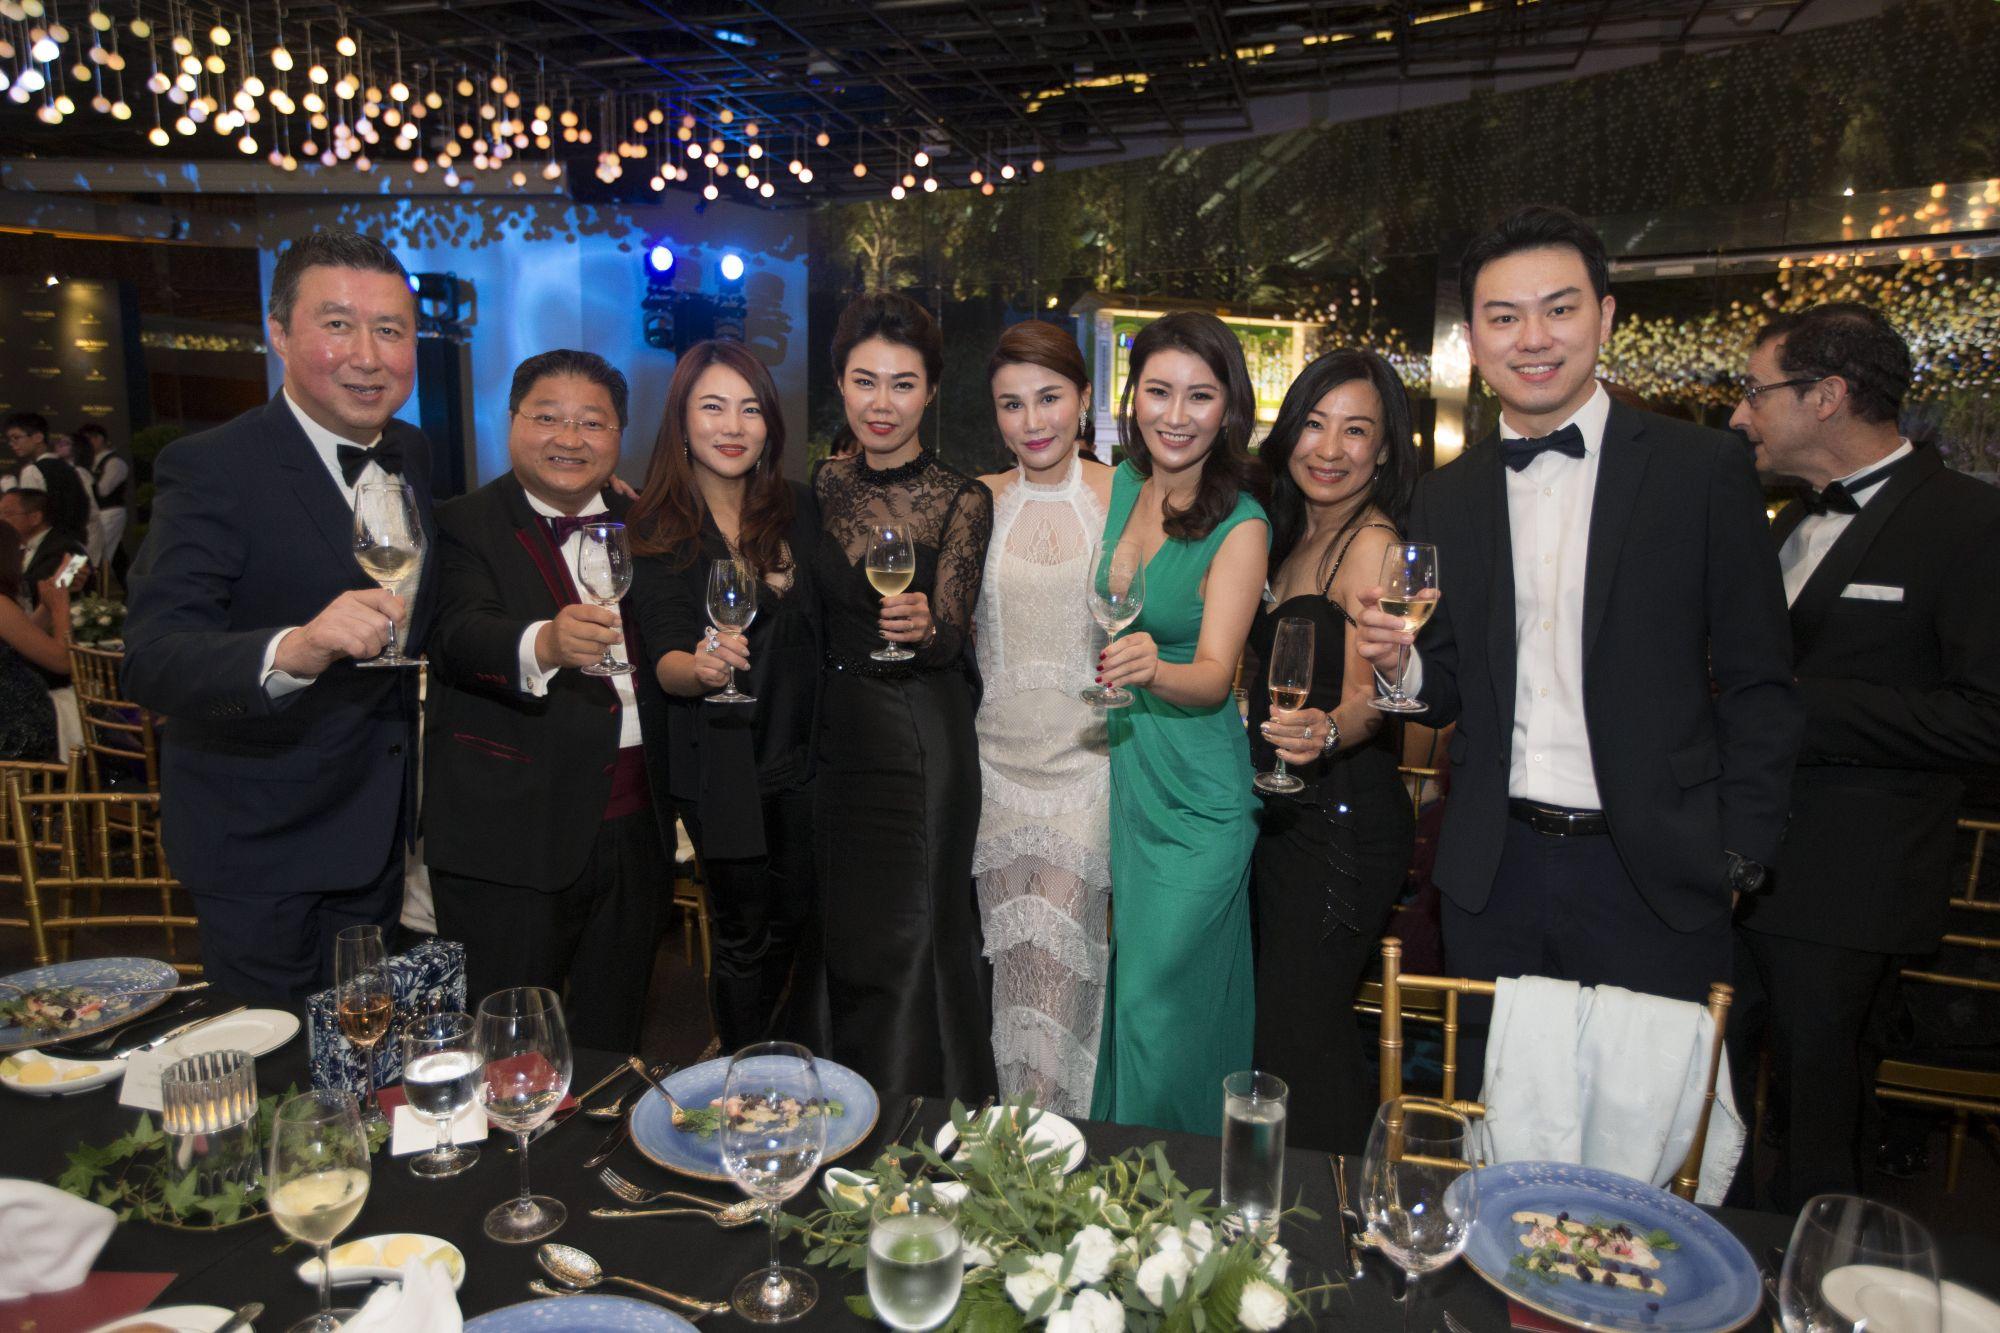 Jeffrey Piak, Andy Kuek, Wendy Poh, Angela Ngoh, Jilly Wang, Zhang Keke, Mildred Kuek, Nigel Lim